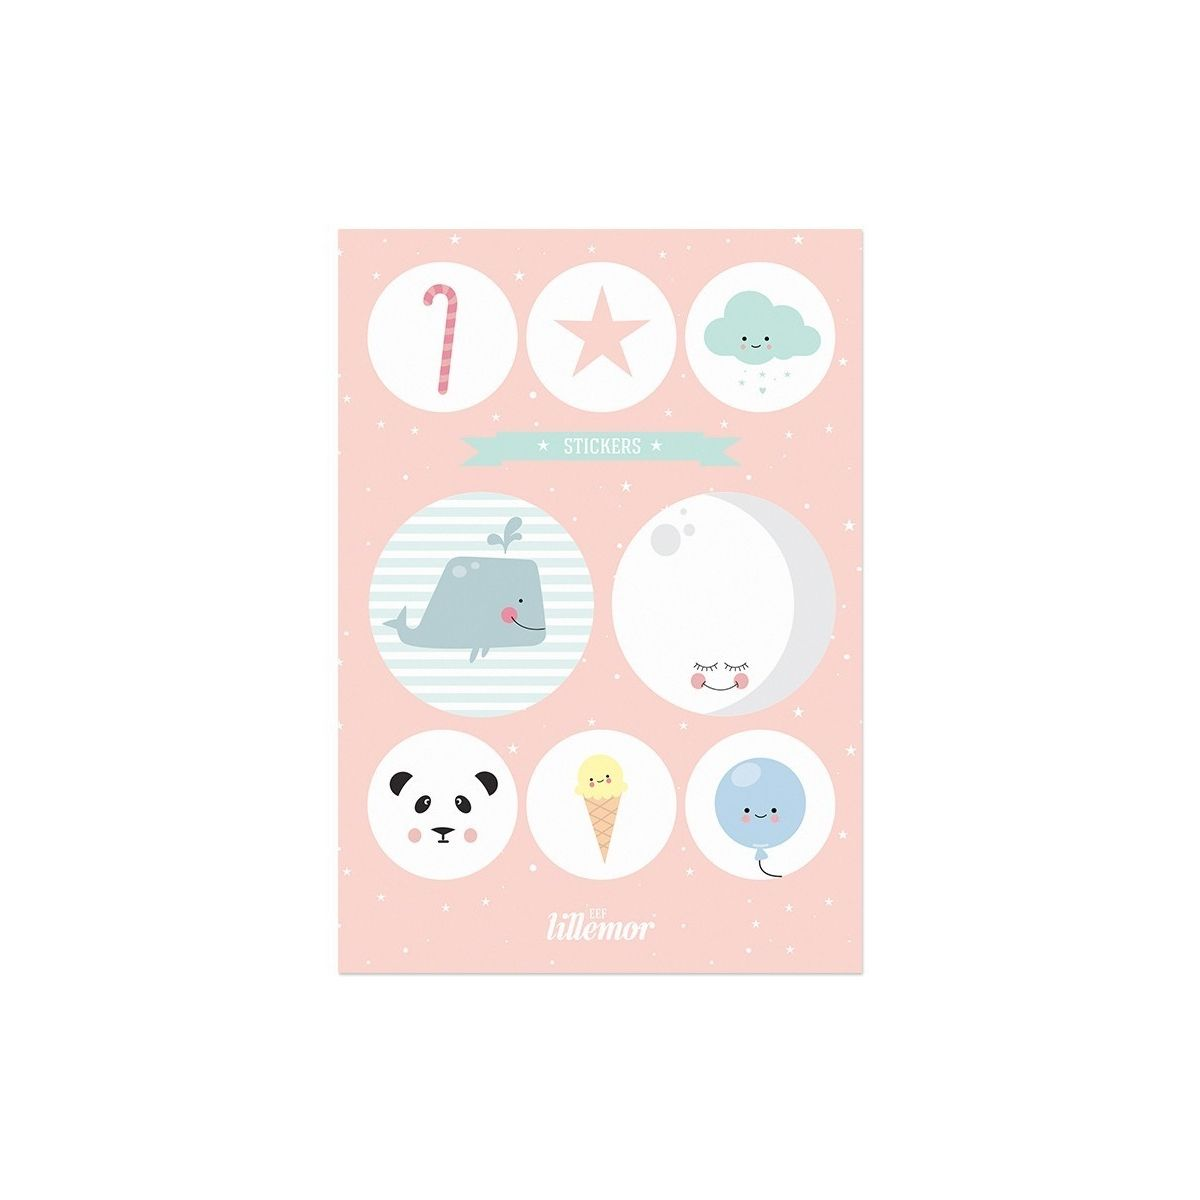 Naklejki Stickers pink set różowe - Eef Lillemor